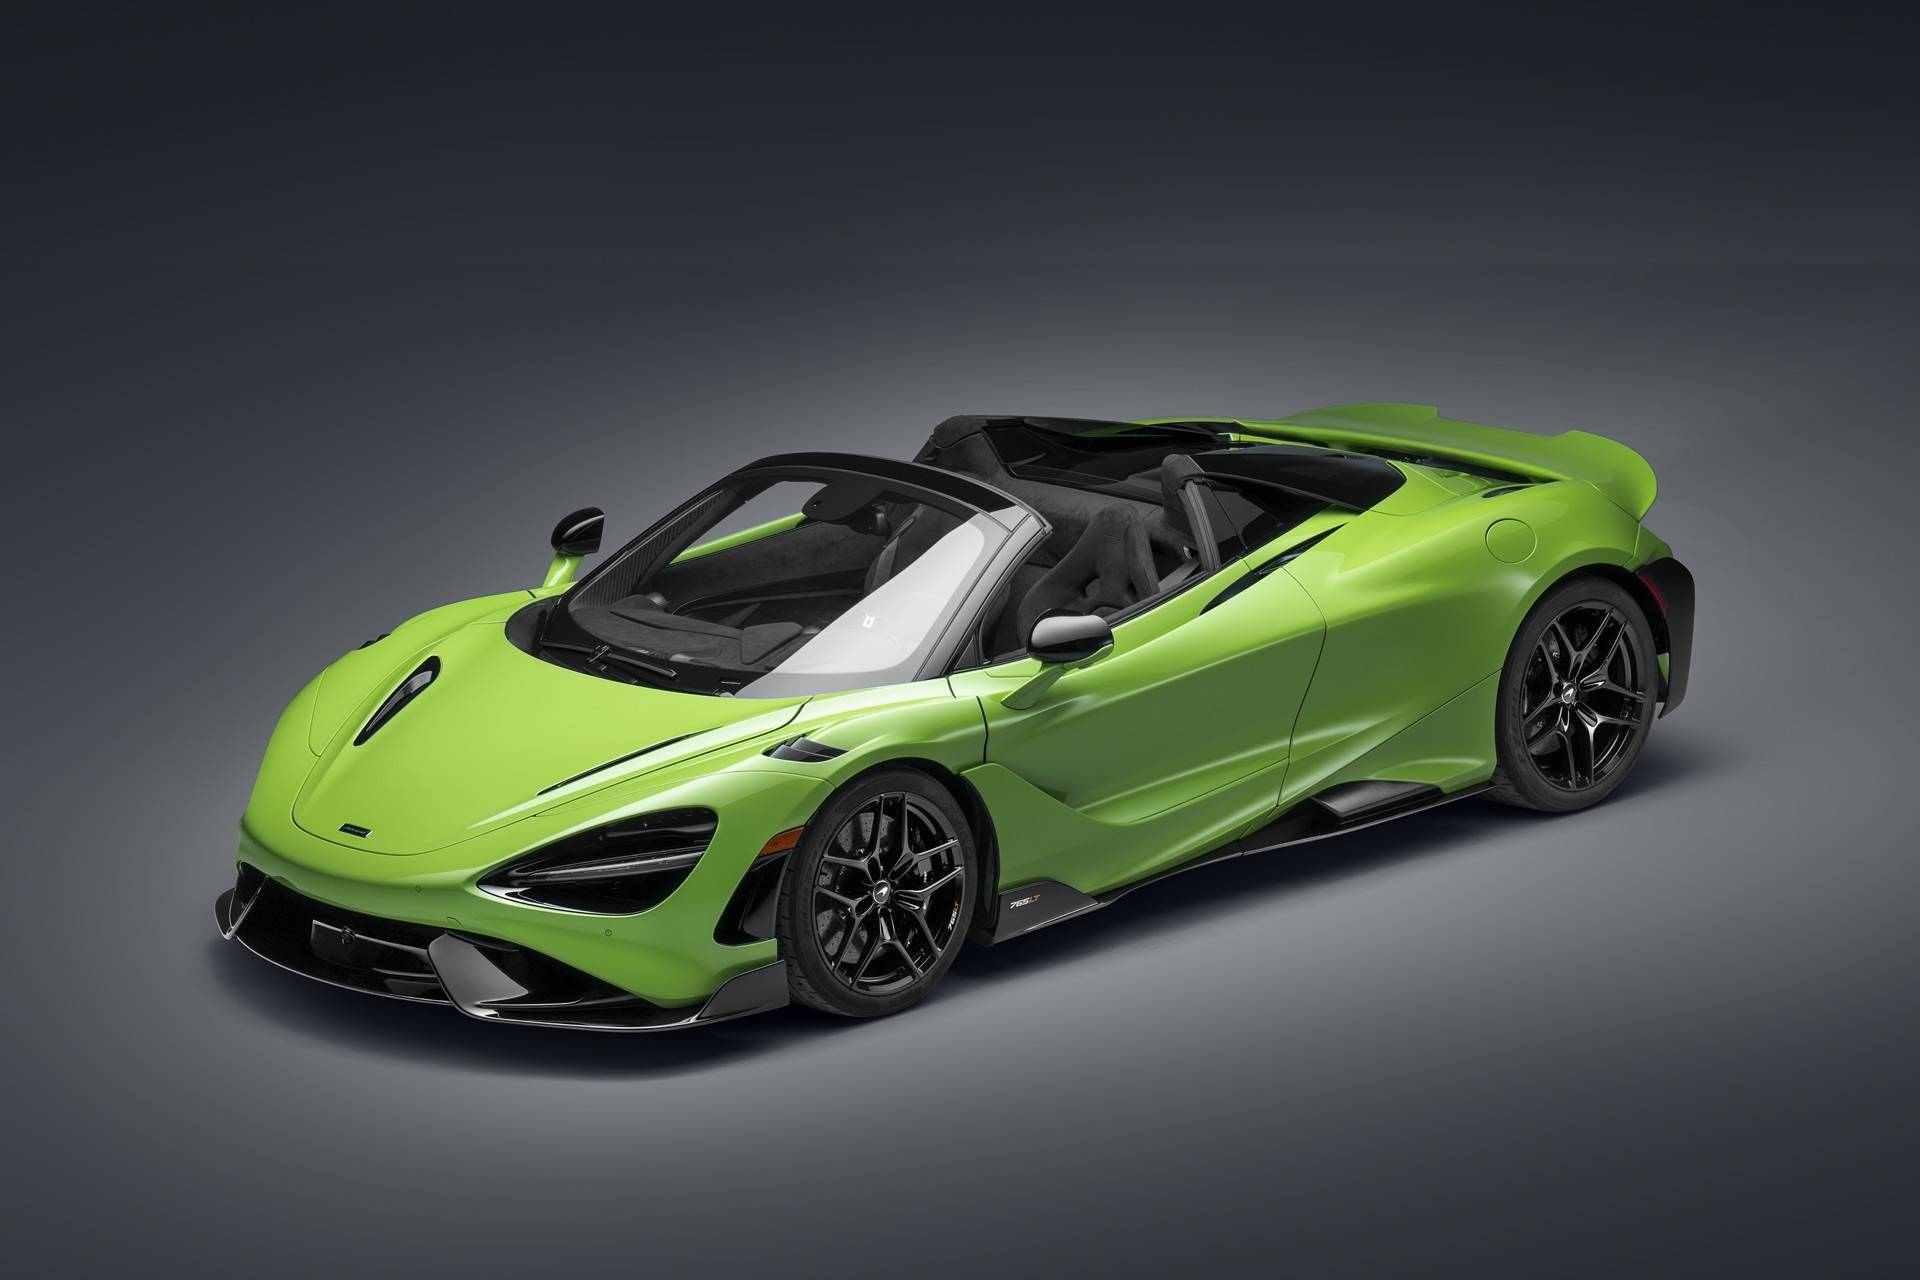 McLaren_765LT_Spider-Studio-20-F3Qhigh2